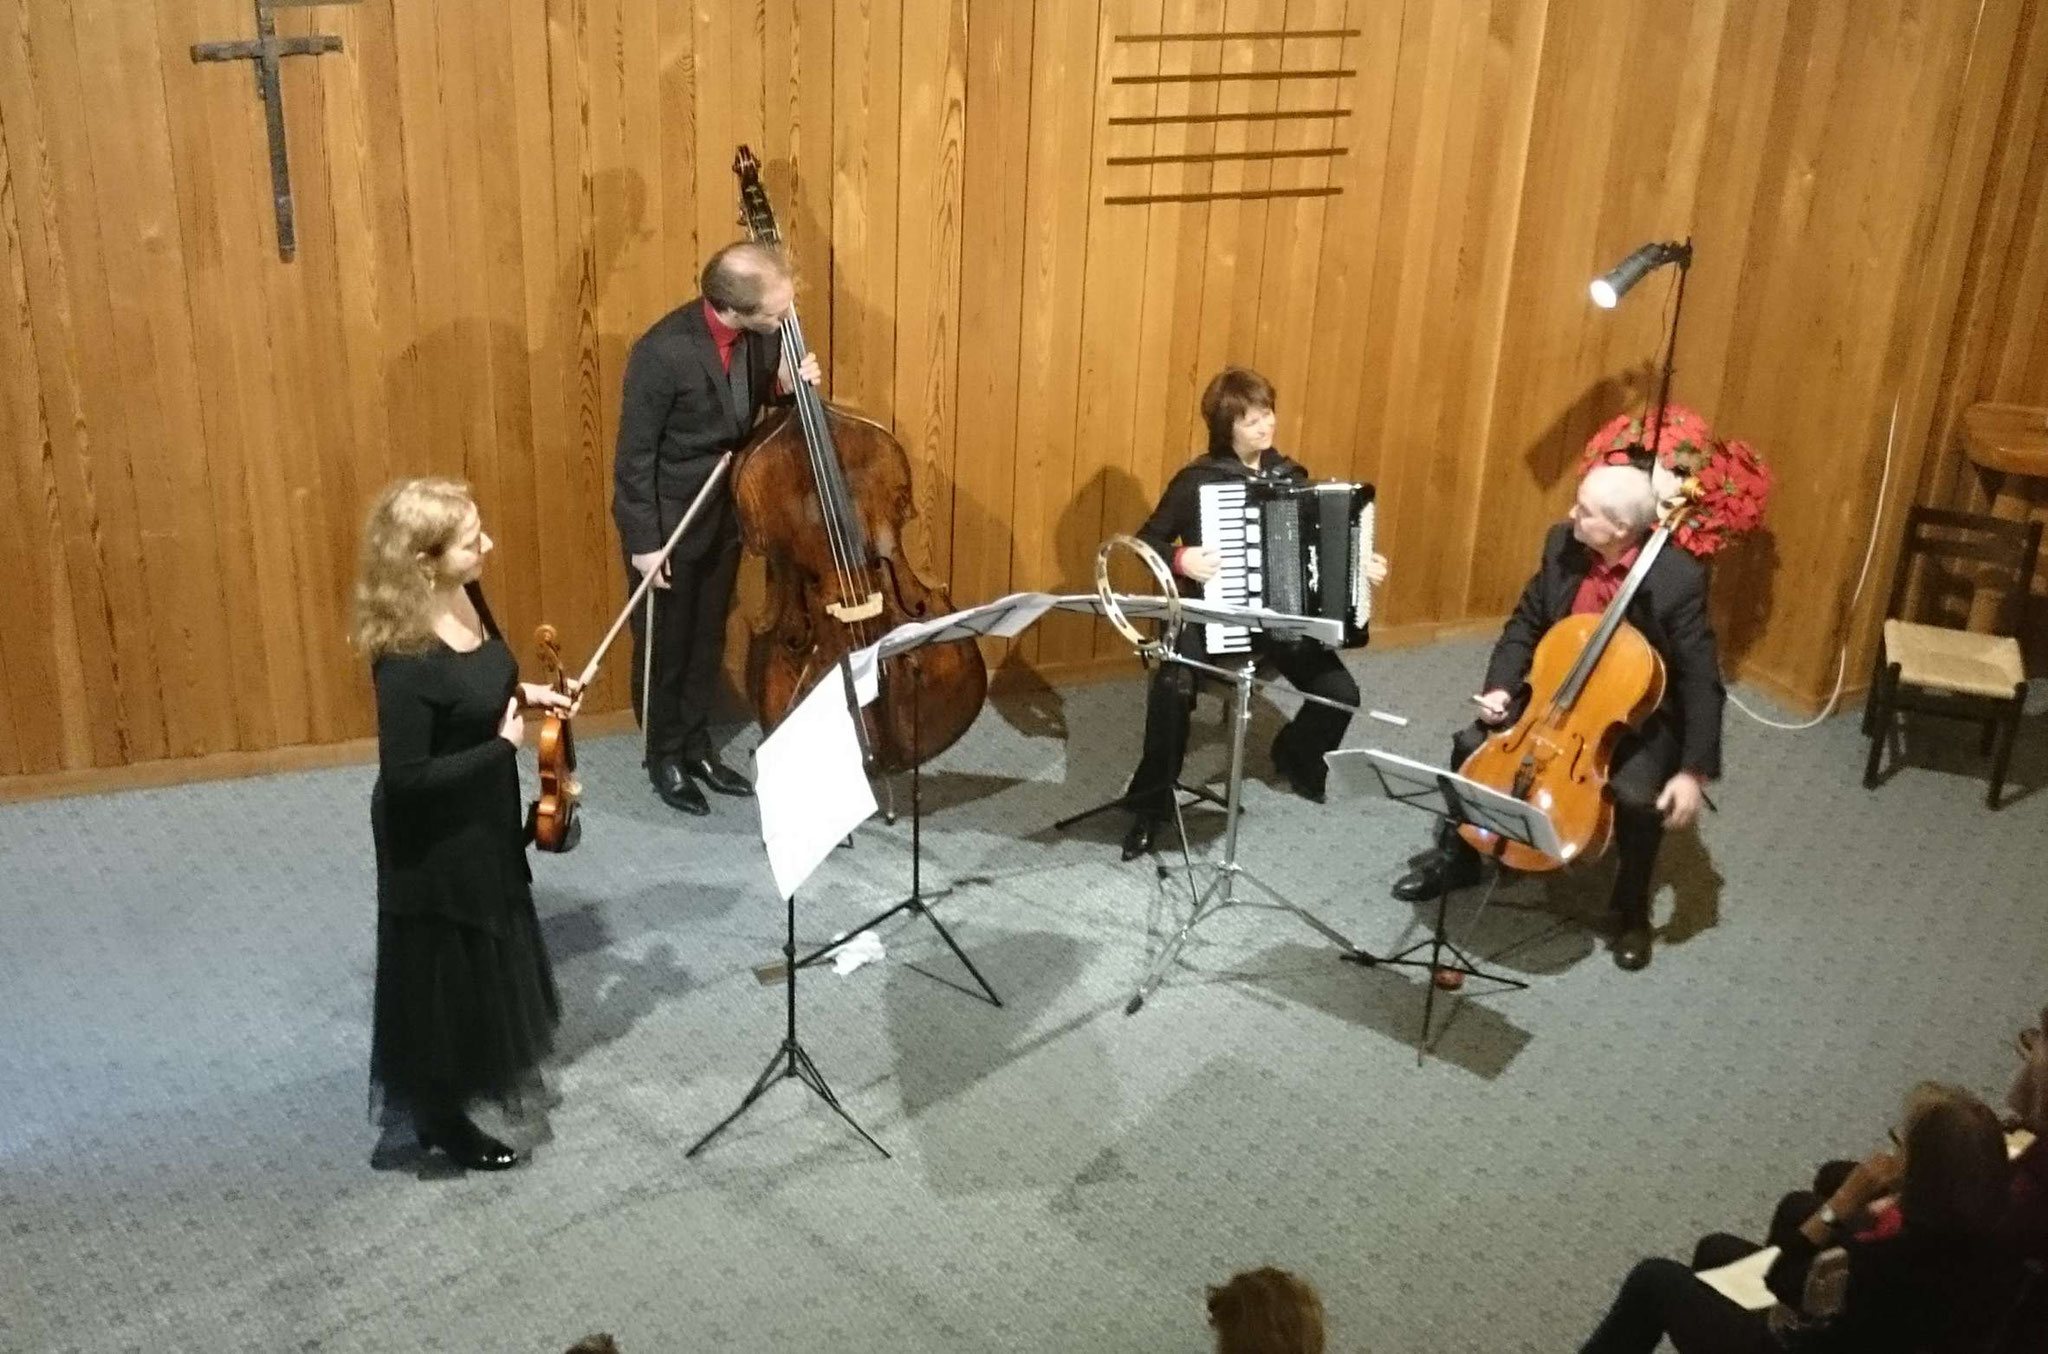 2017 Ensemble 'non Sordino' mit Heldengeschichten